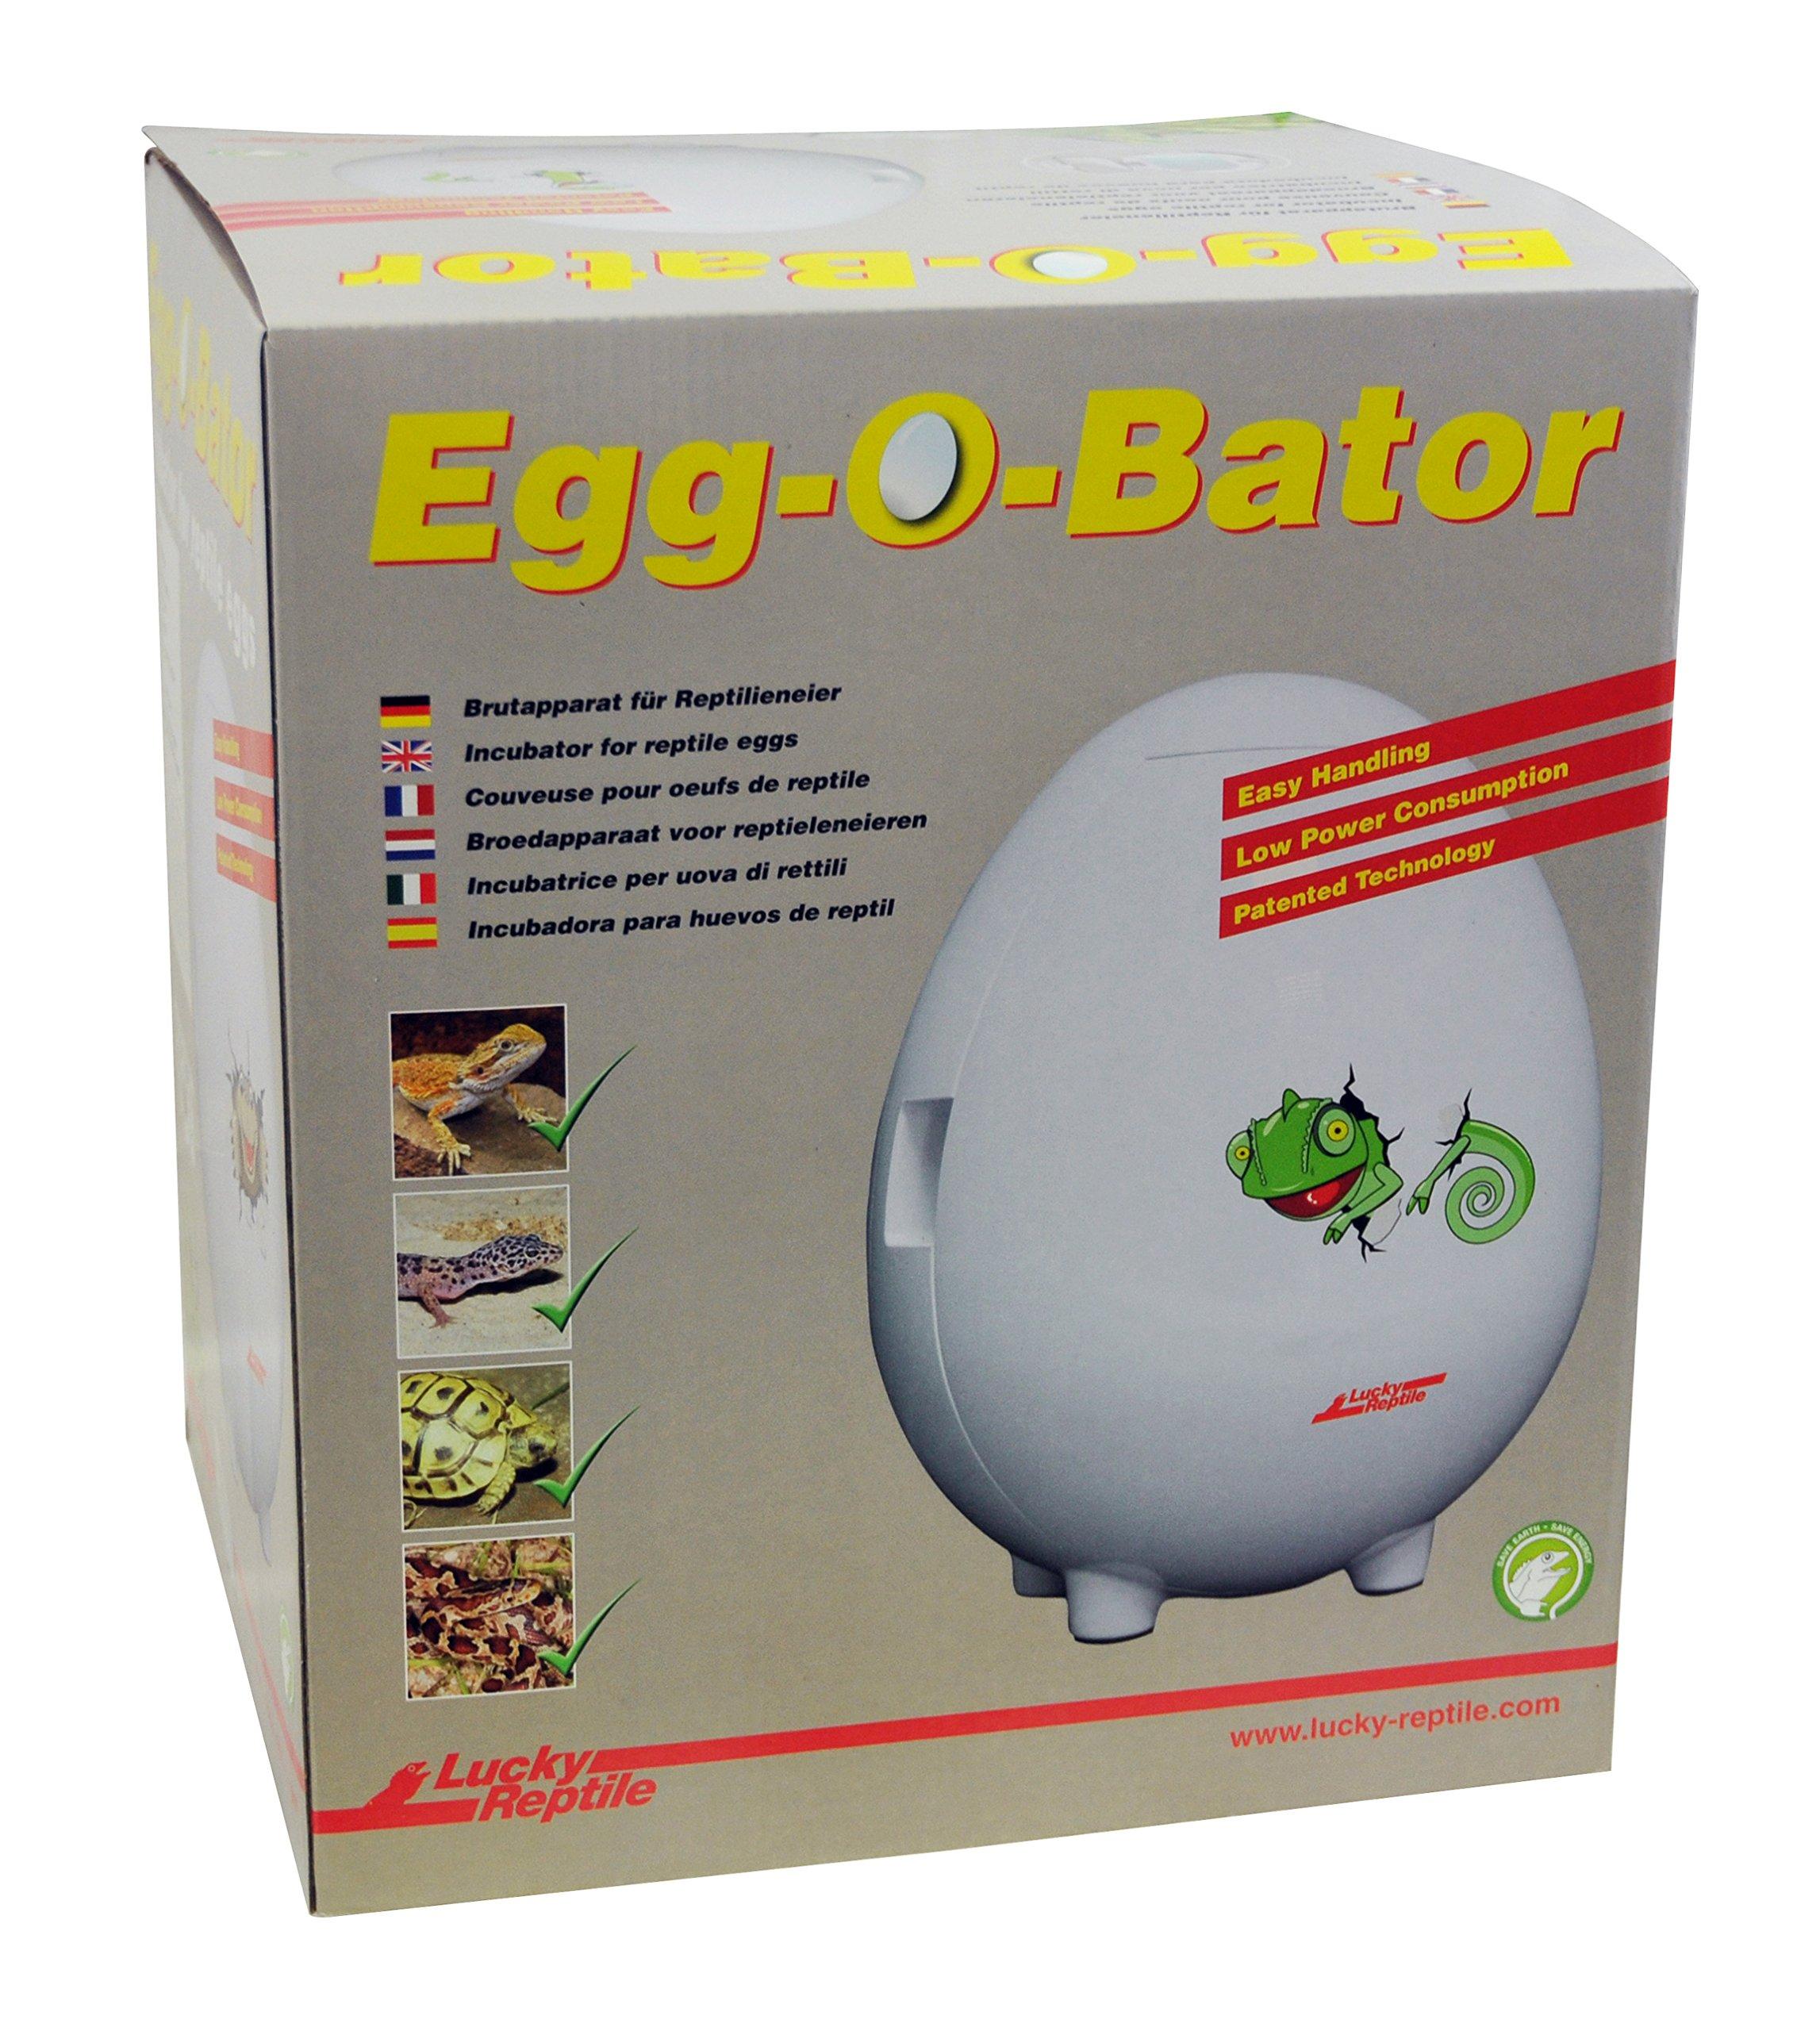 23L 6000 Ztopia Reptile Egg Incubator 23L Capacity Mini Digital Incubator ReptiPro 6000 Hatcher Hot Reptile Incubators for Hatching Eggs